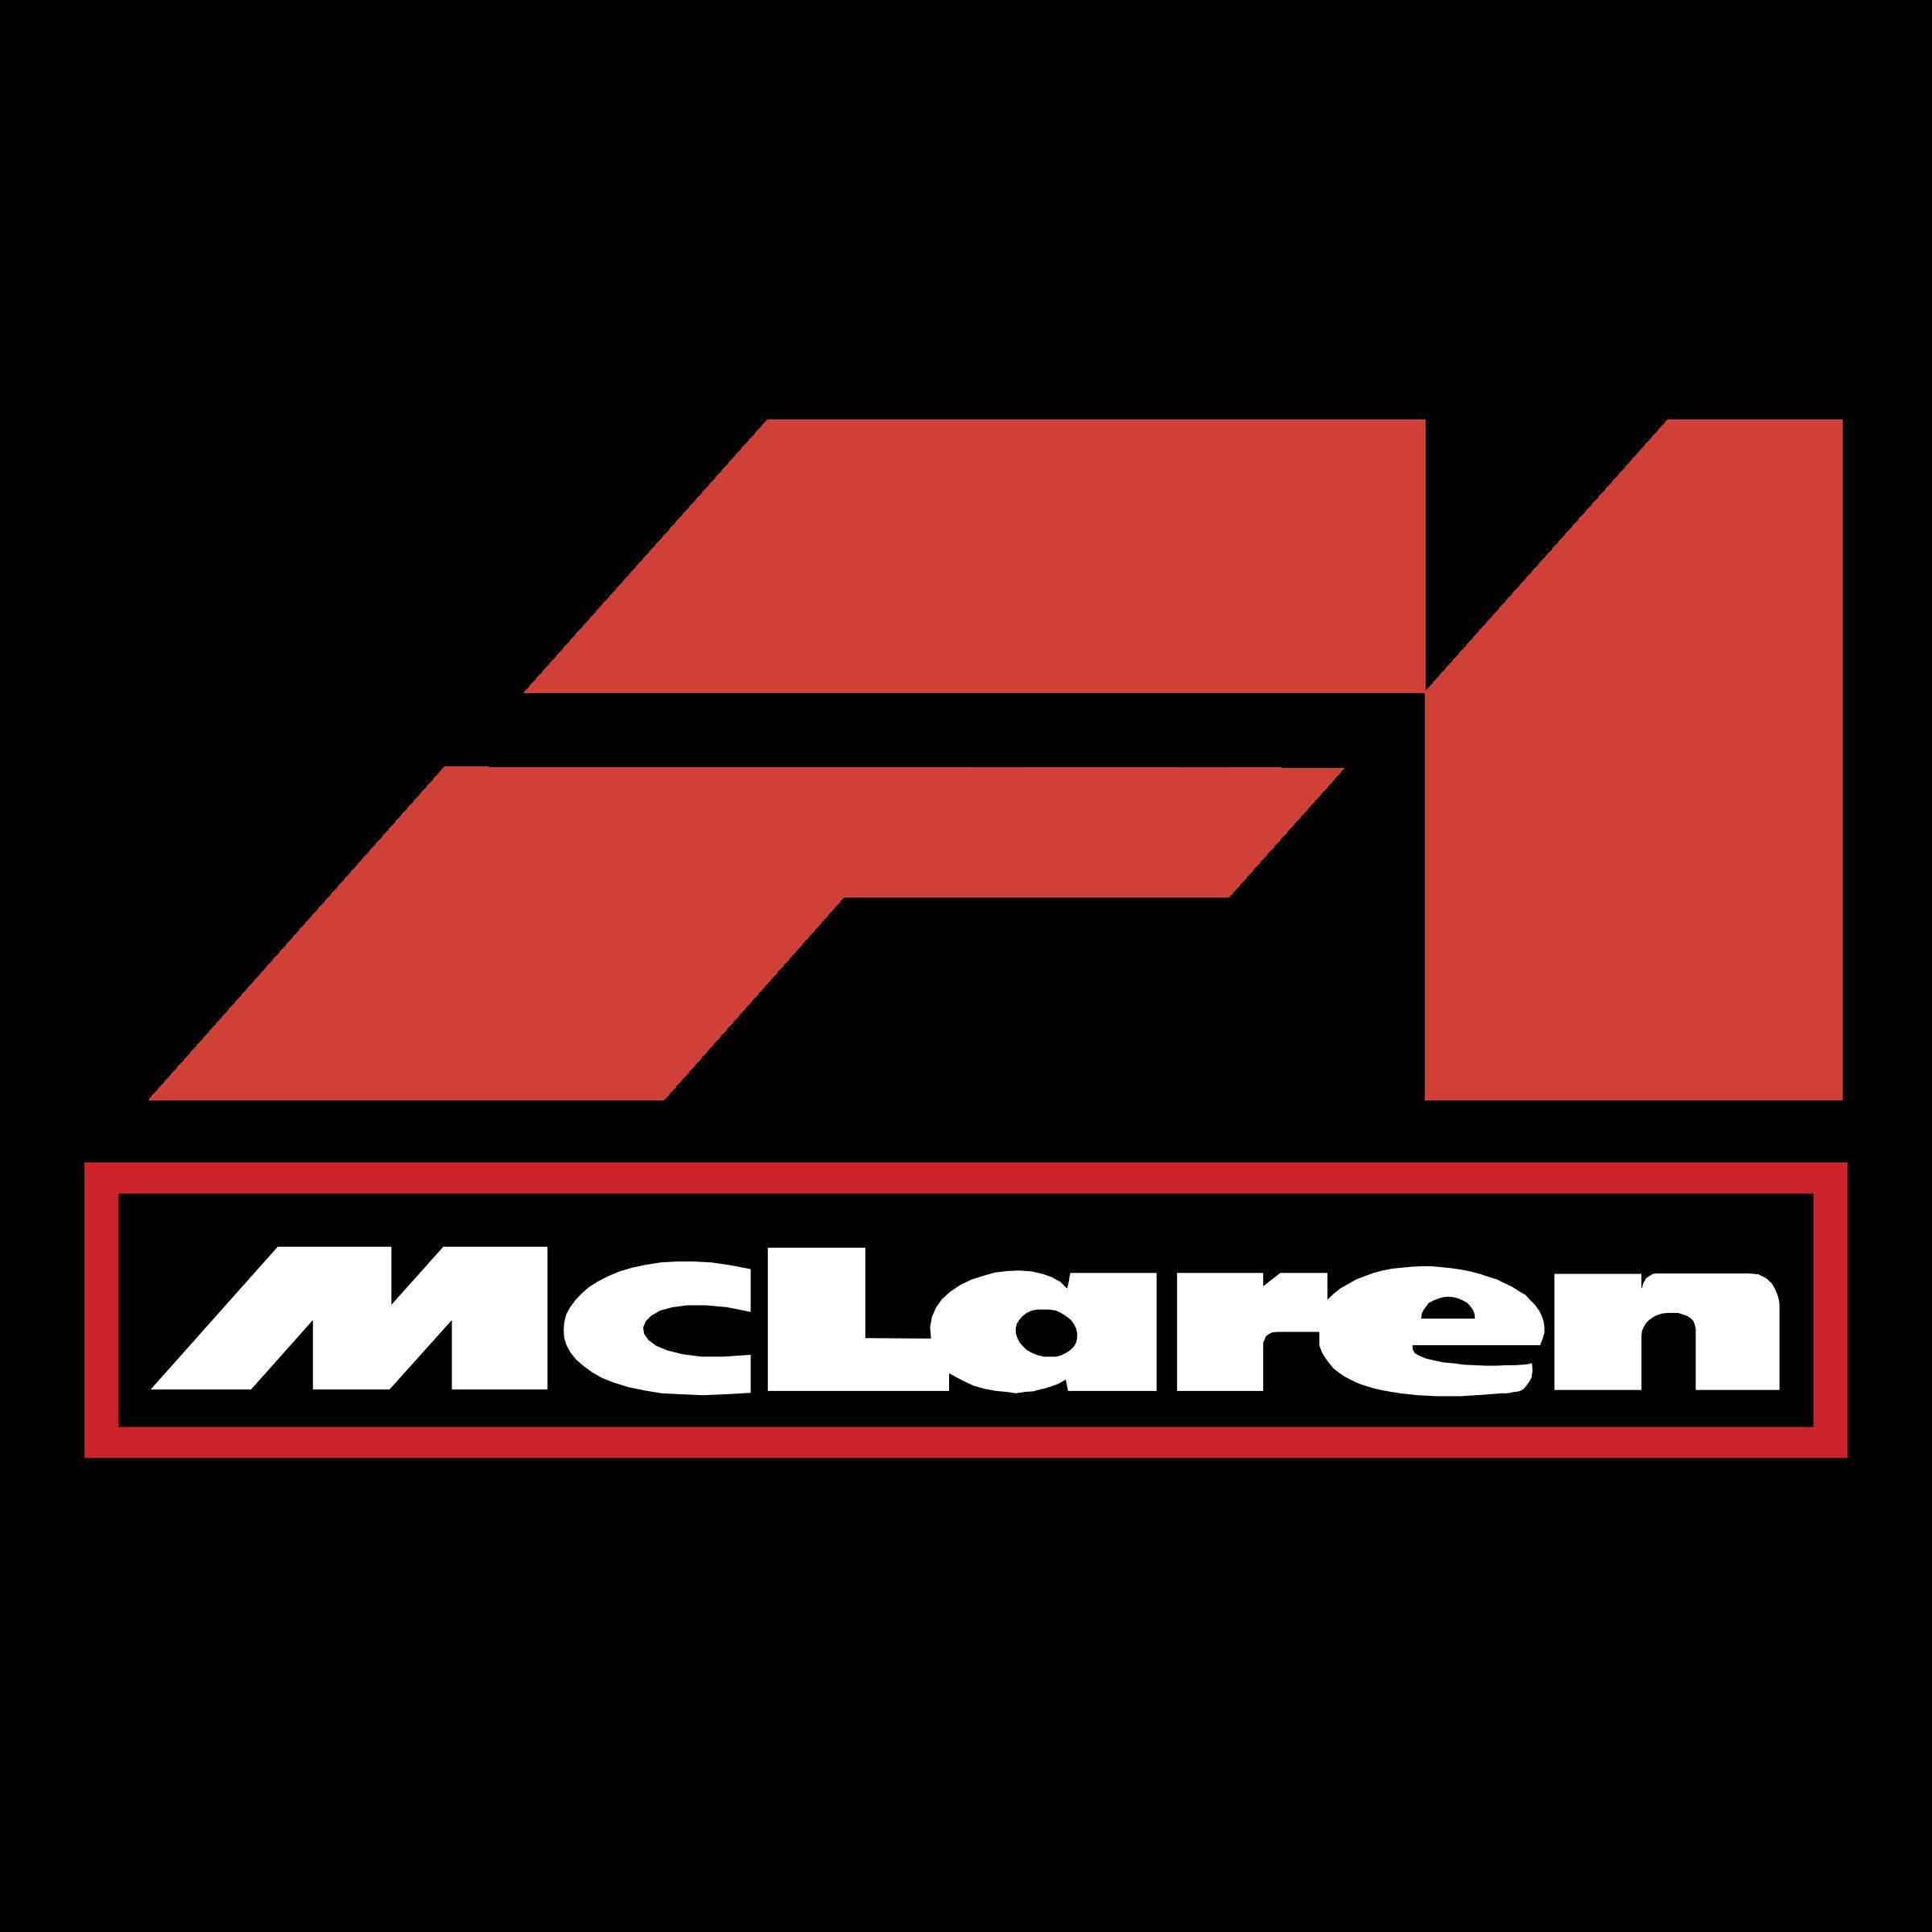 McLaren F1 Logo PNG Transparent & SVG Vector - Freebie Supply